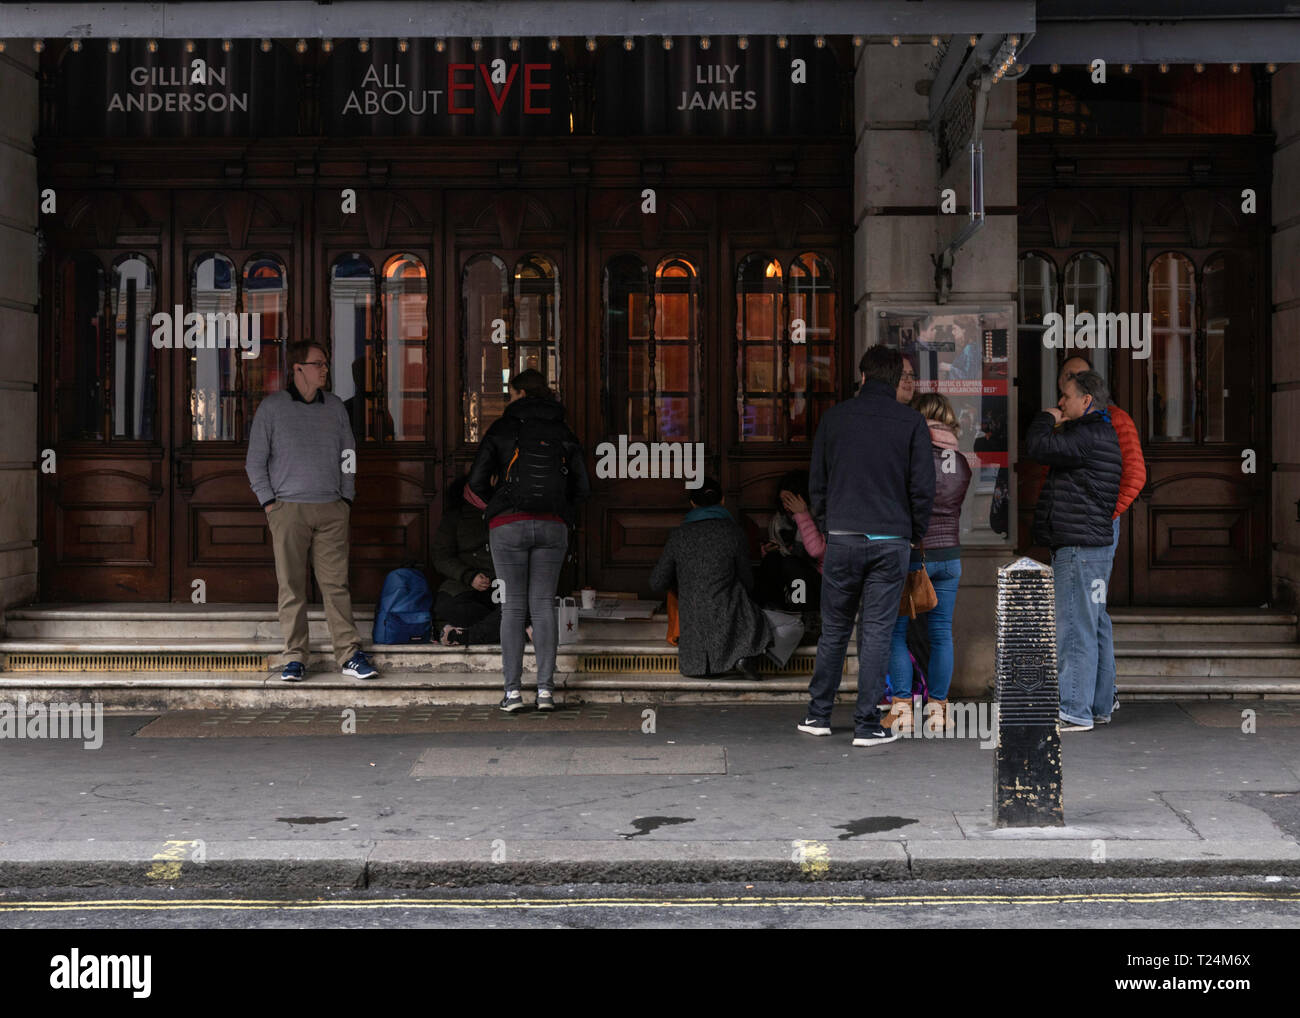 London life at night - Stock Image